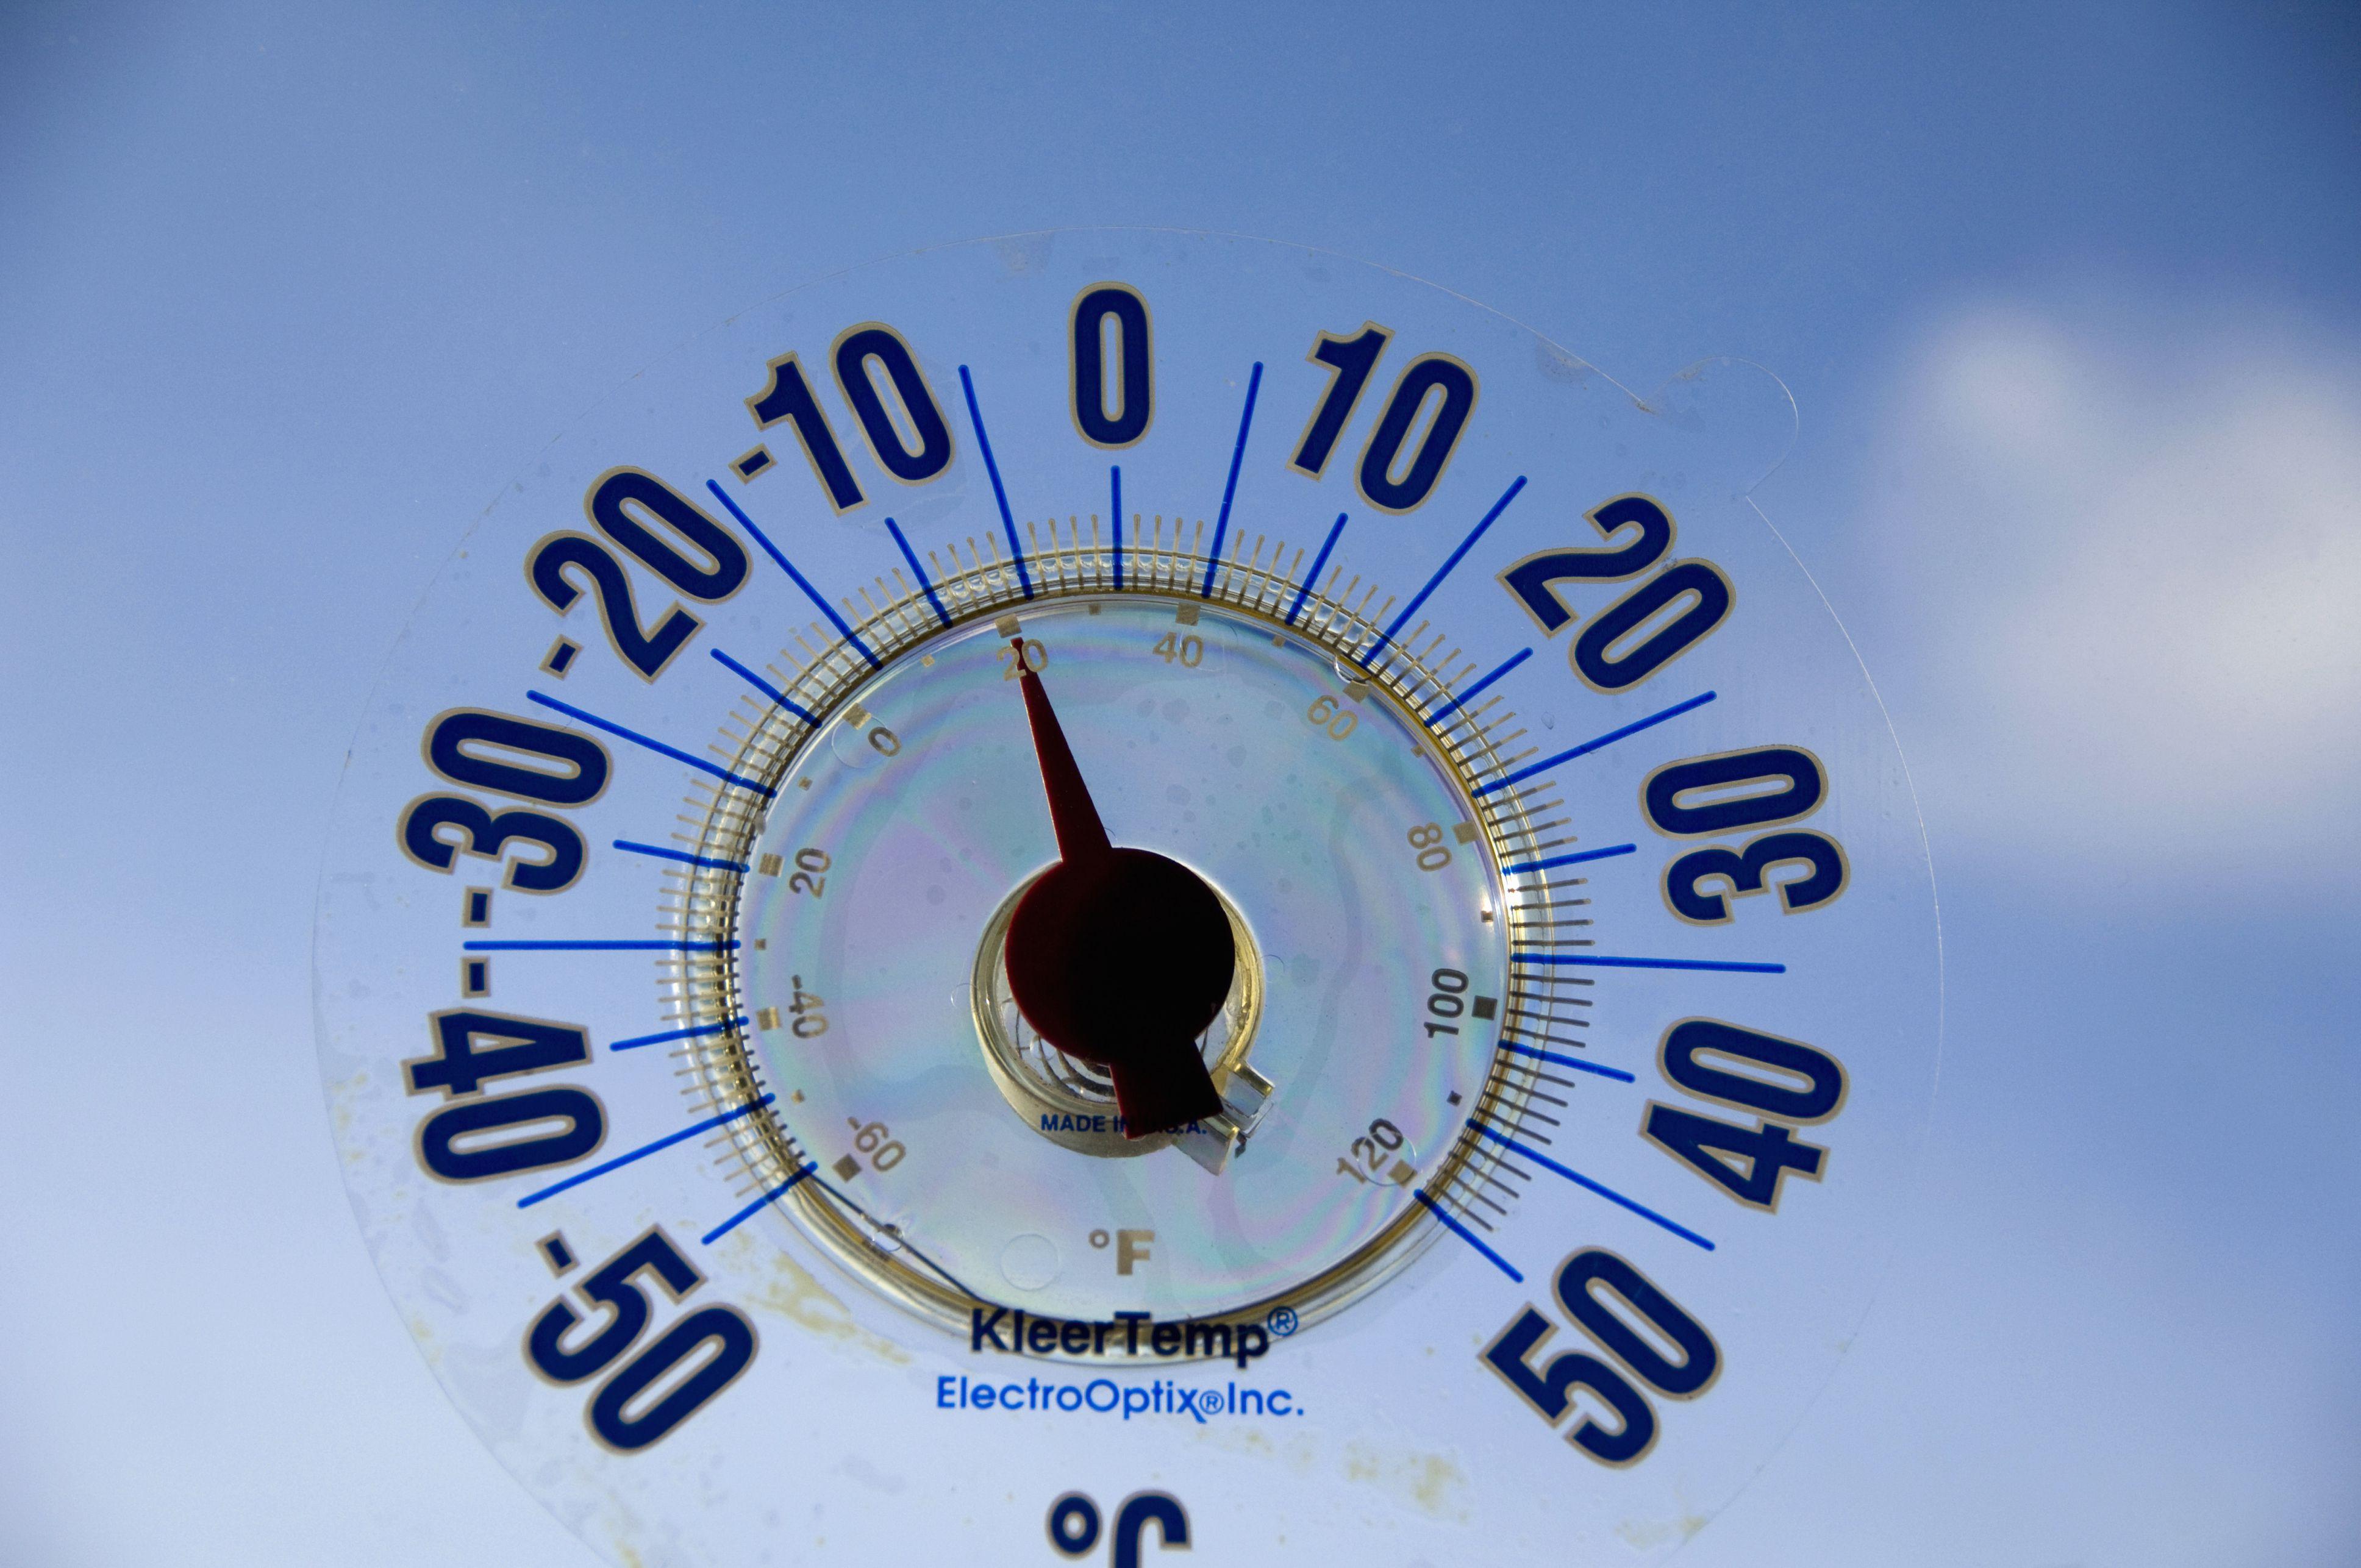 Celsius Temperature Scale Definition